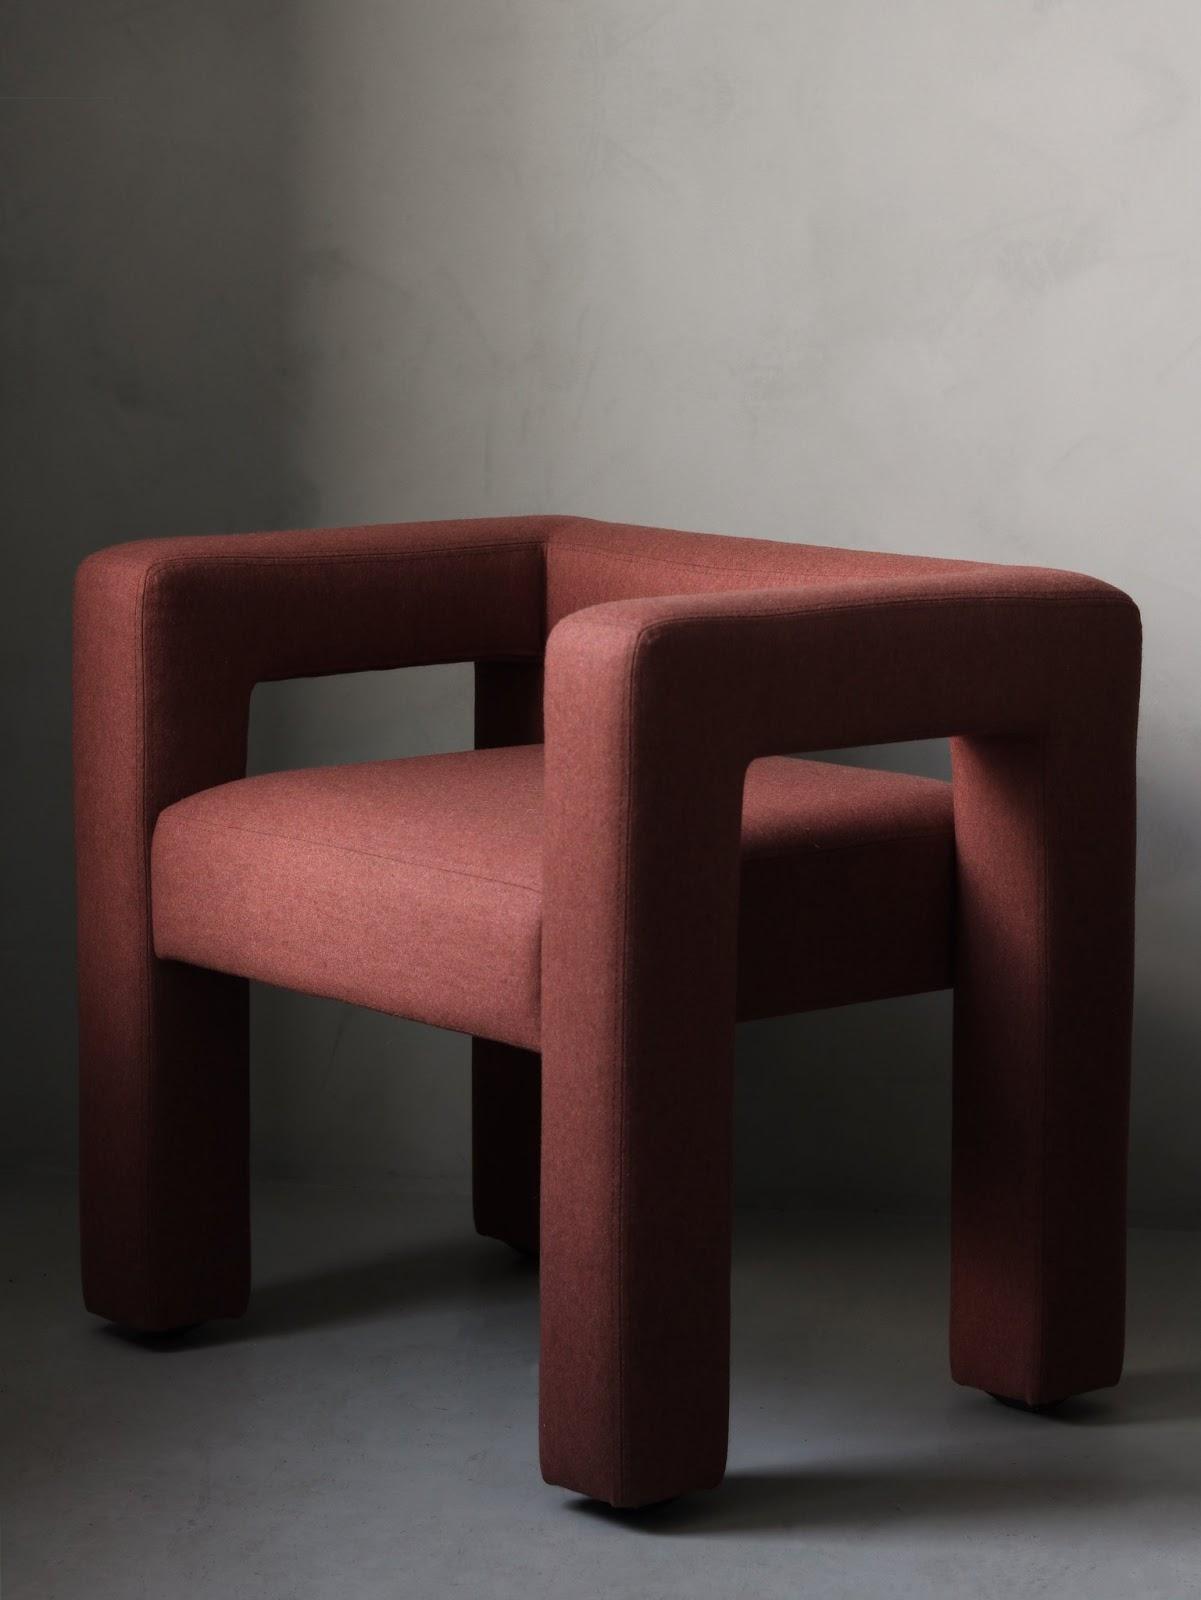 Faina's Toptun chair is perfect geometry